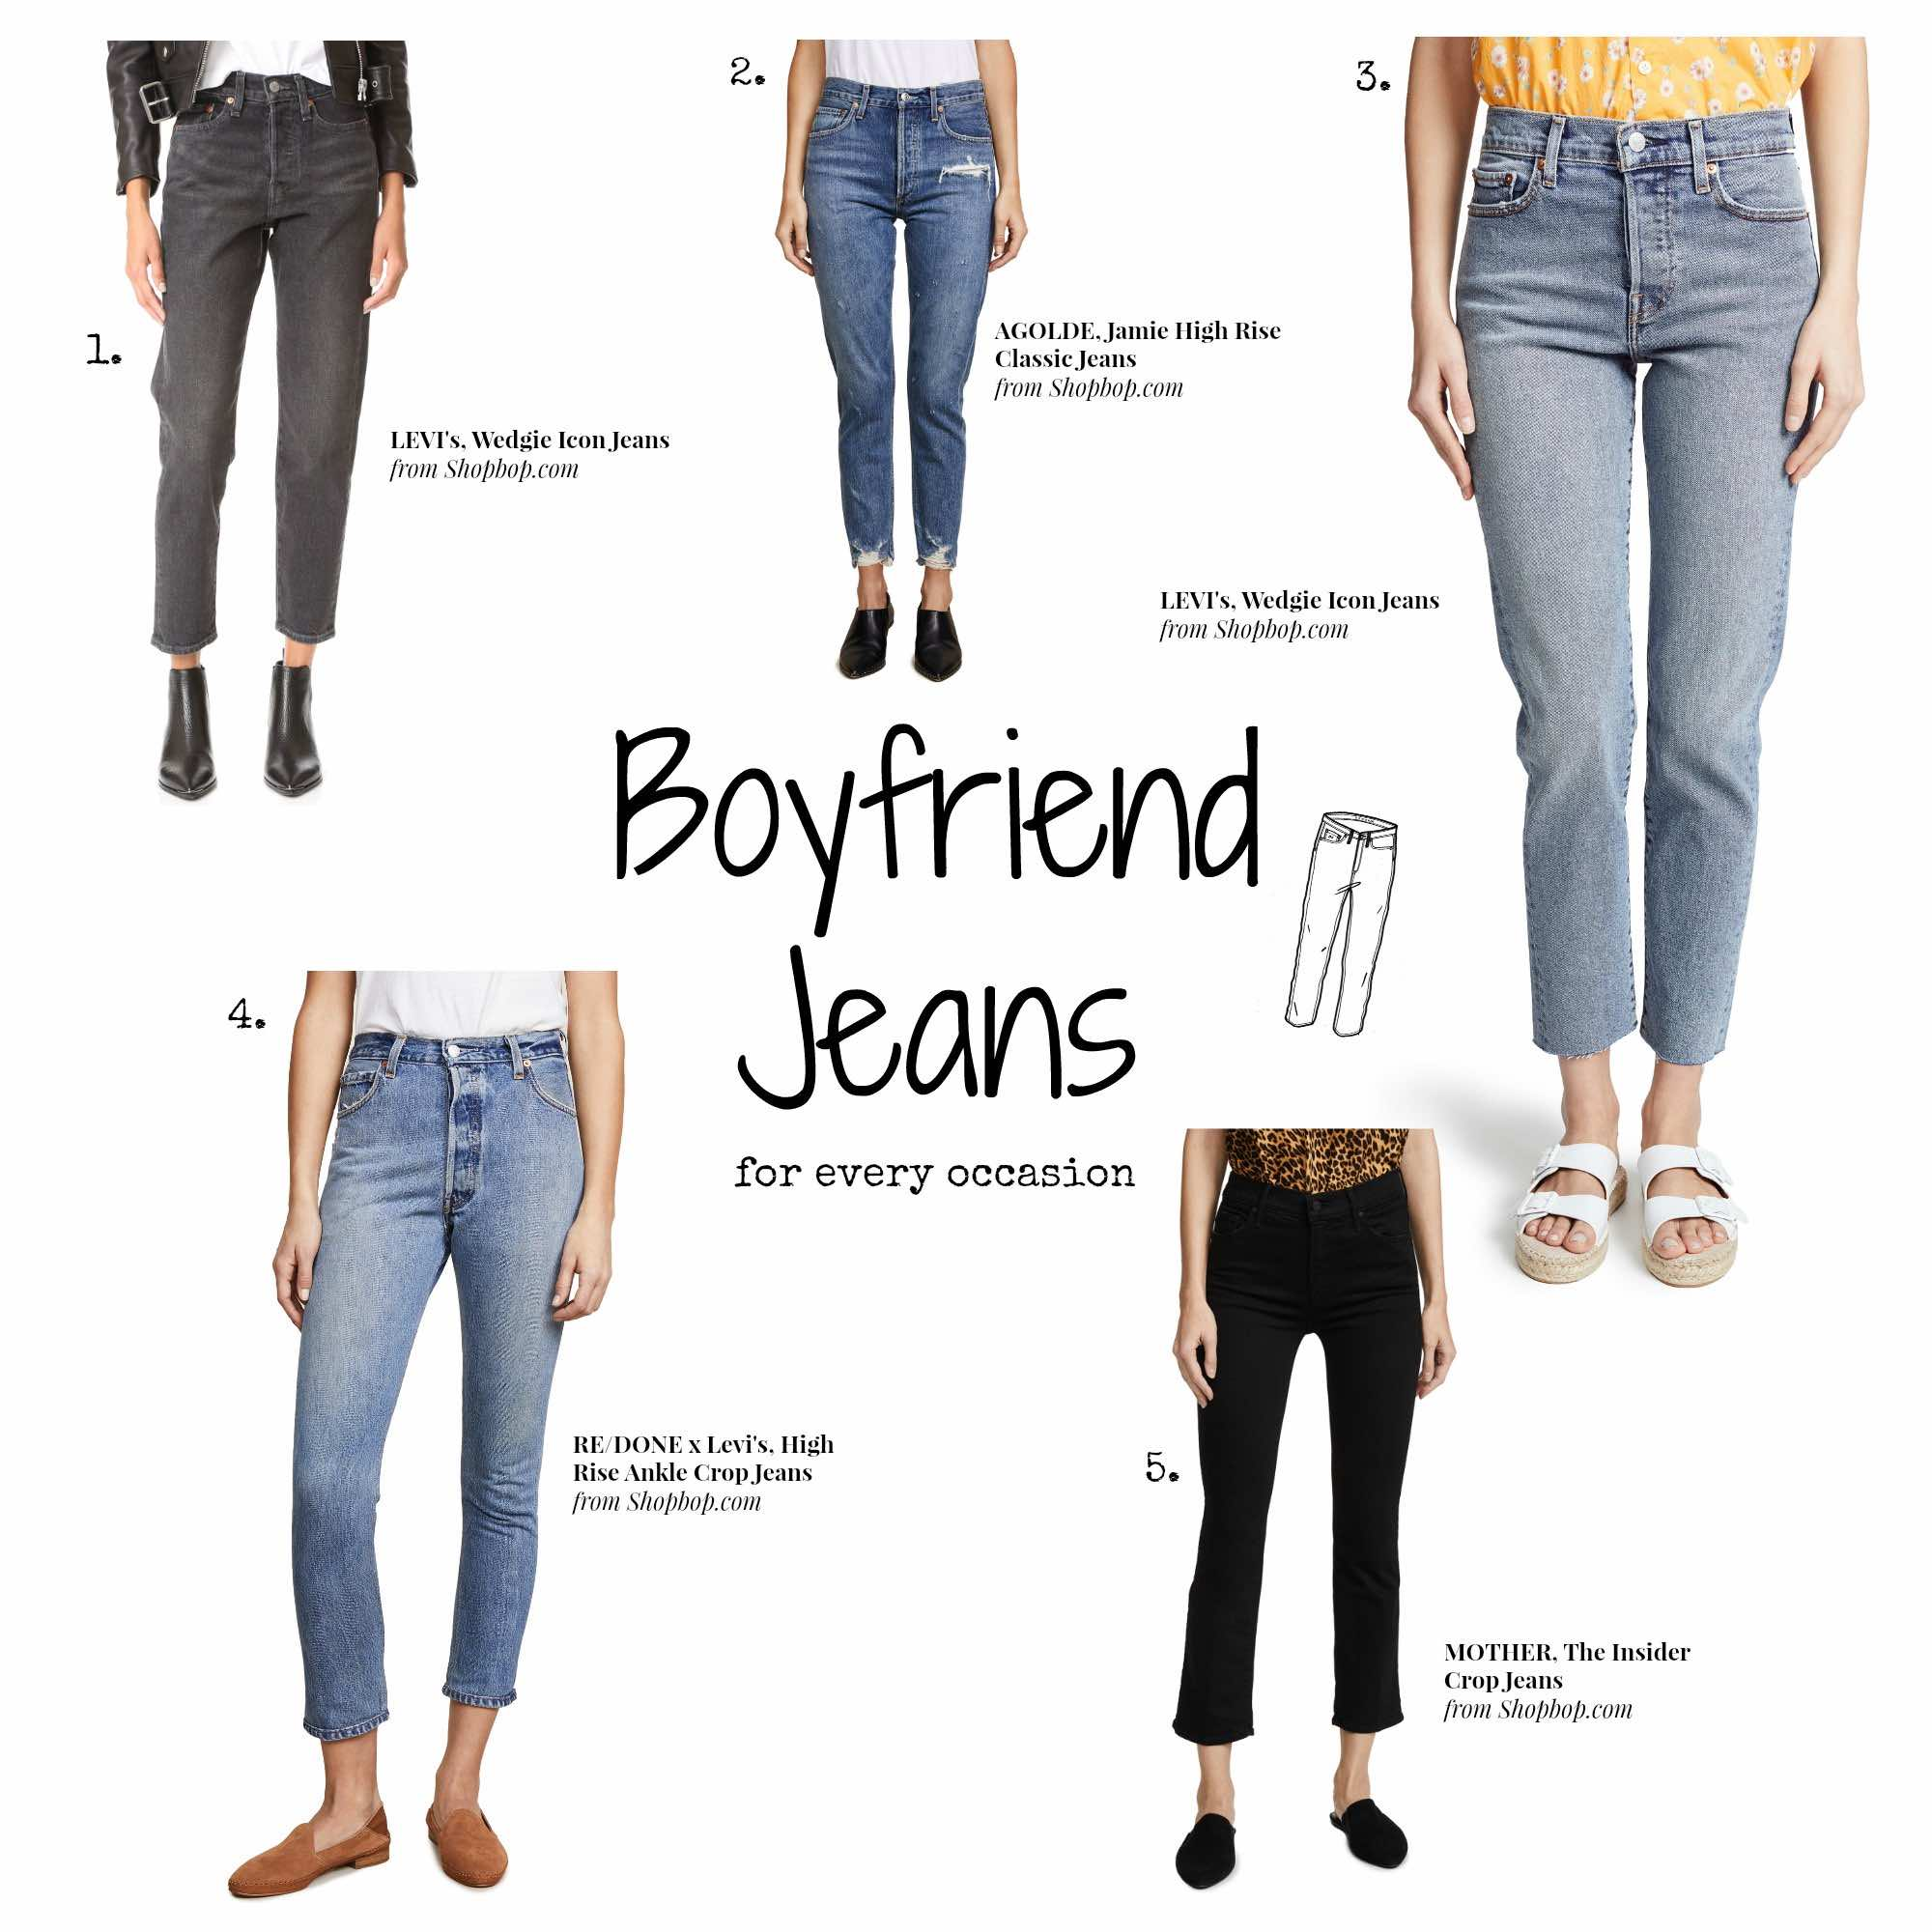 Shopbop Sale - Boyfriend Jeans